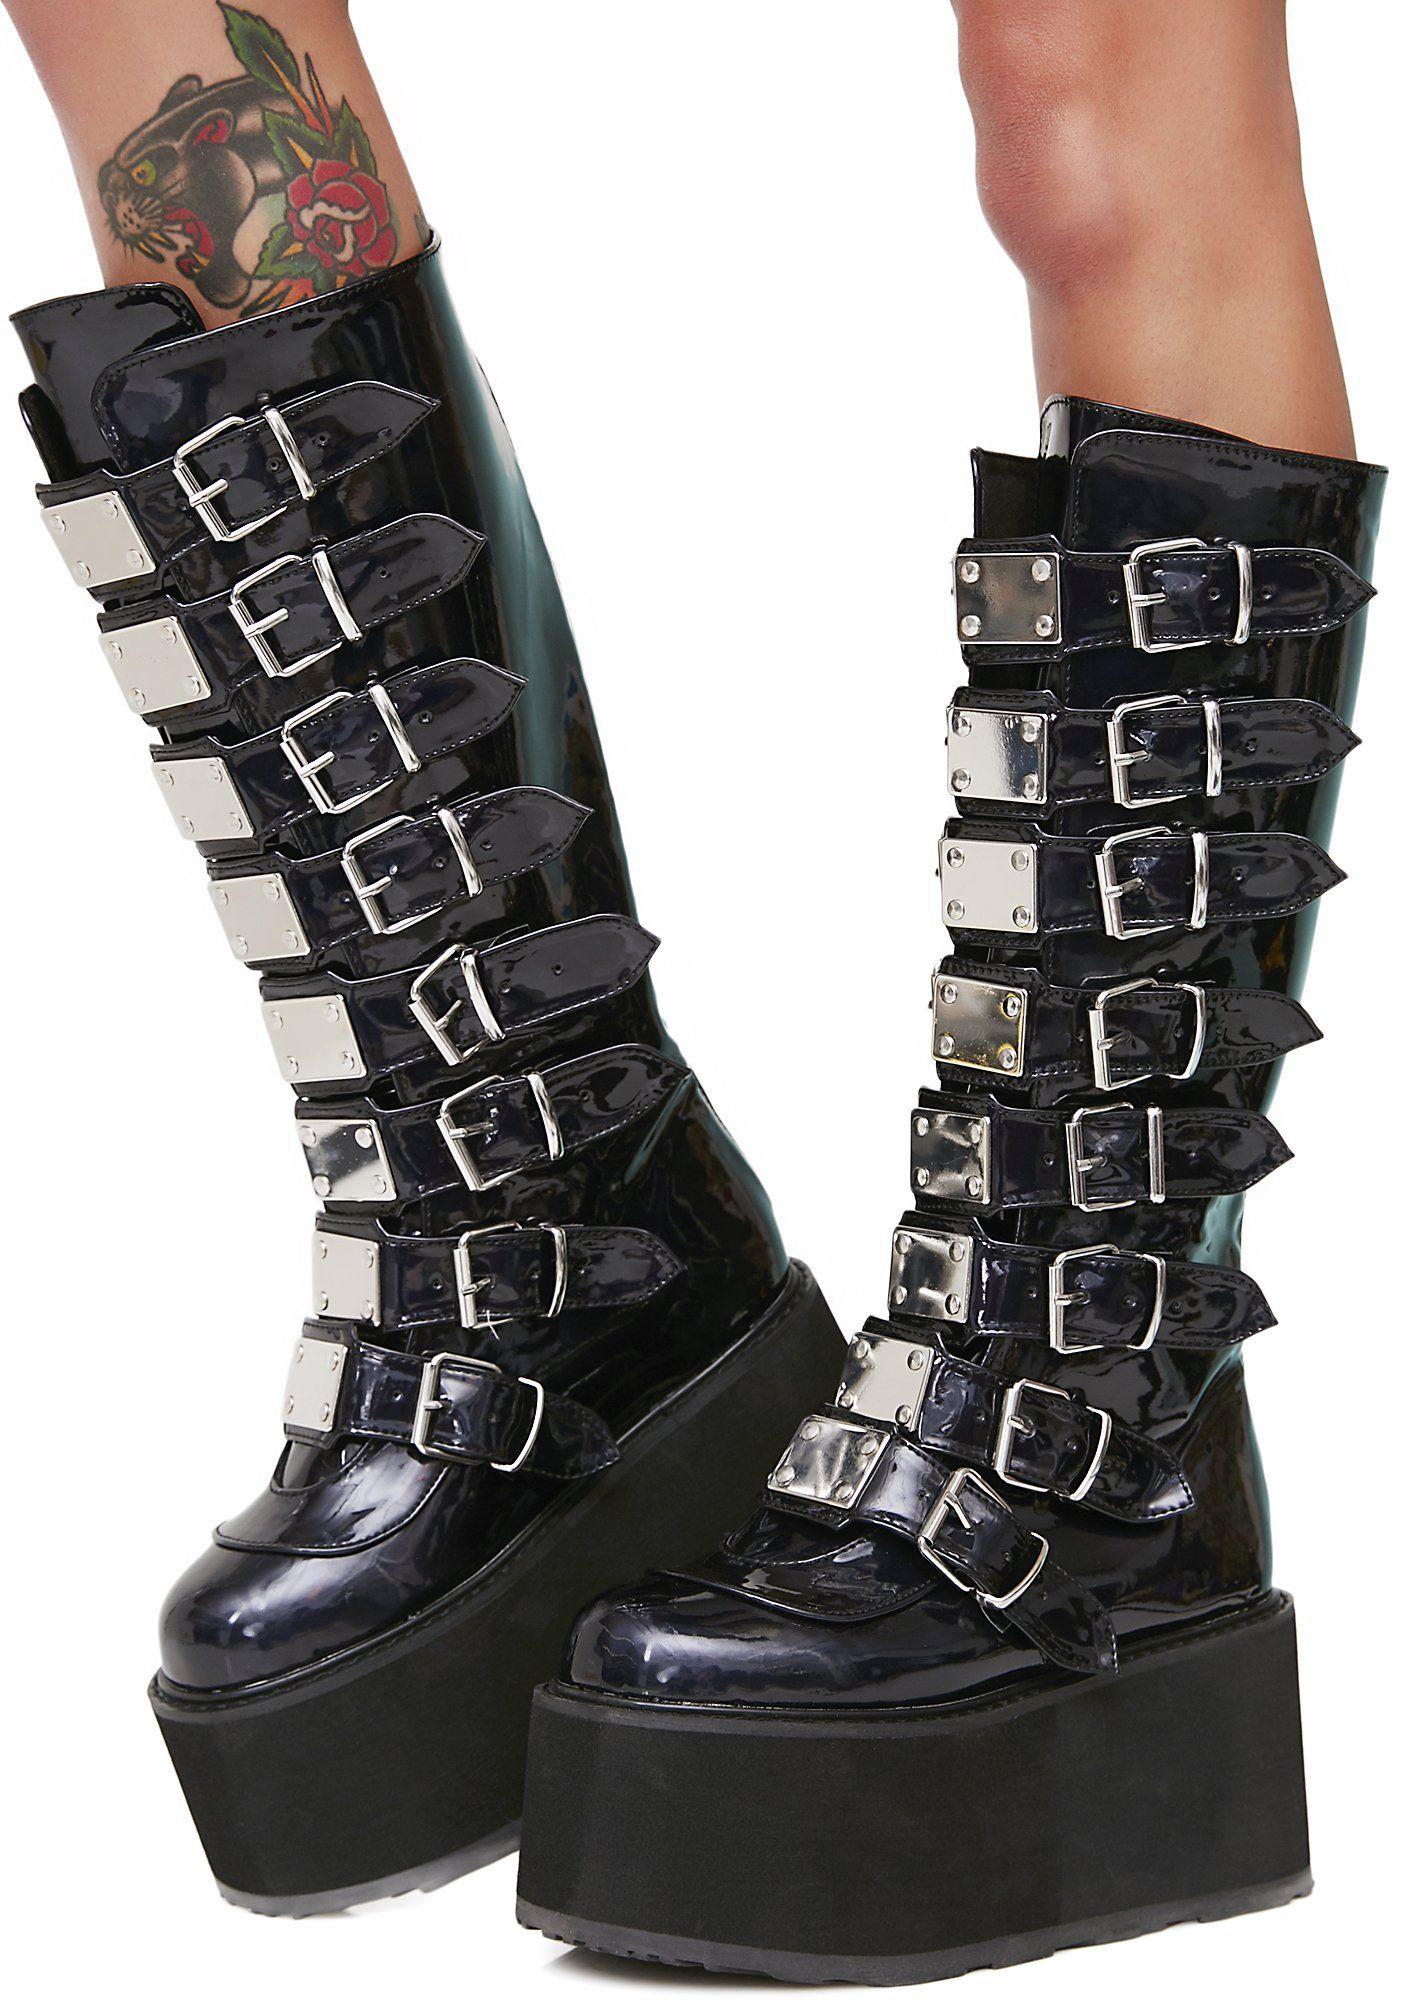 82d93e8d0 Shoes & Boots | goth stuff | Boots, Platform boots, Goth boots